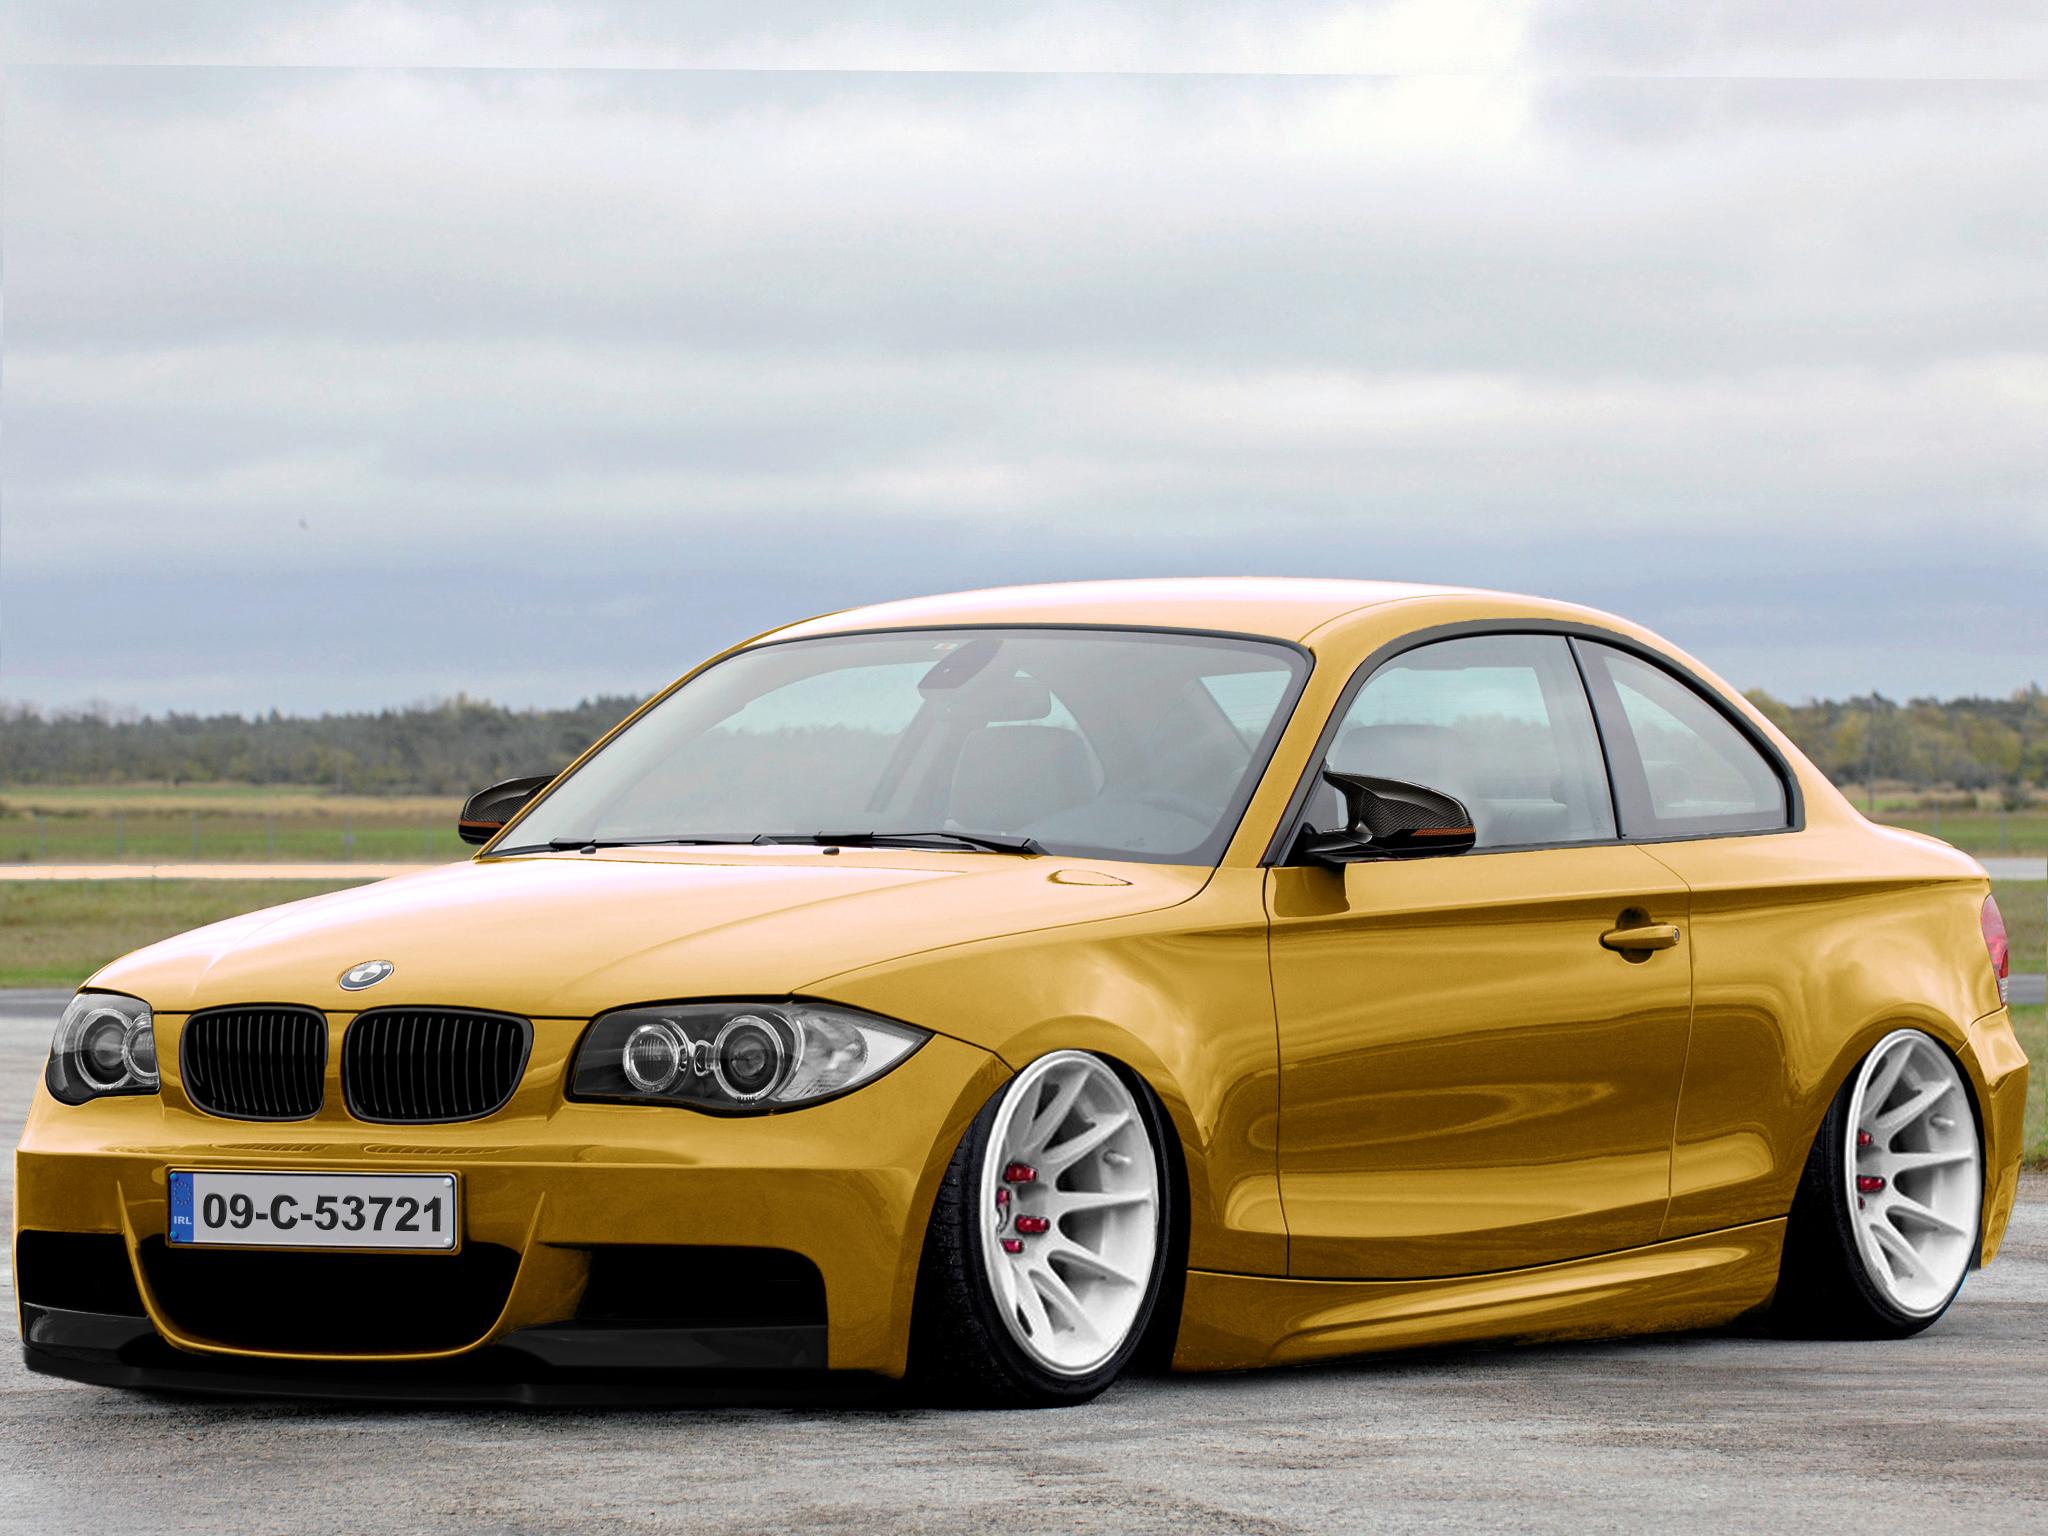 BMW I Coupe By GazzaFTB On DeviantArt - Bmw 135